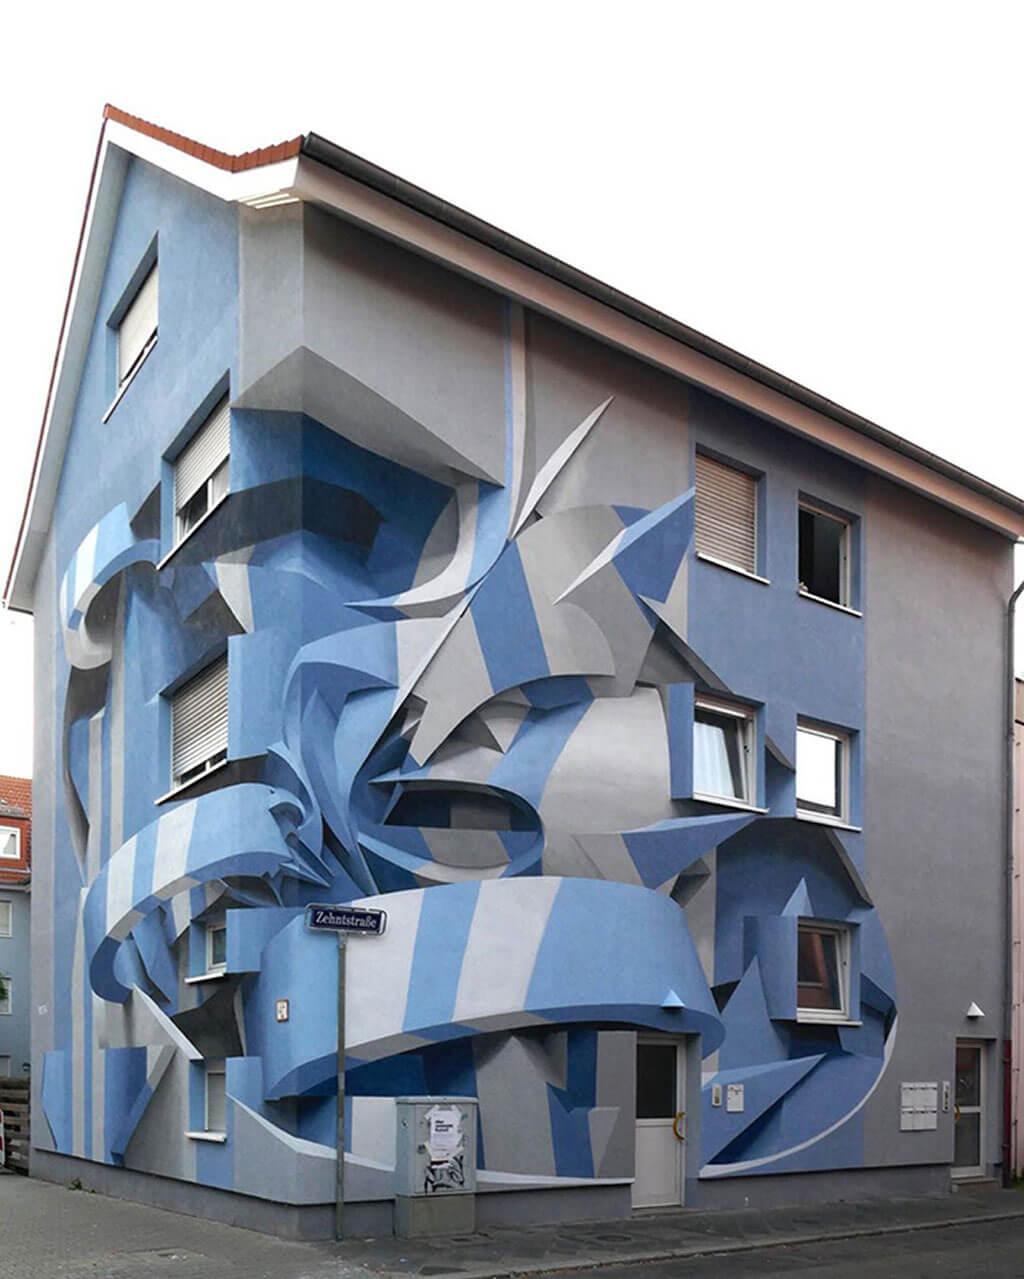 Optical illusion building on a street corner in Manheim, Germany